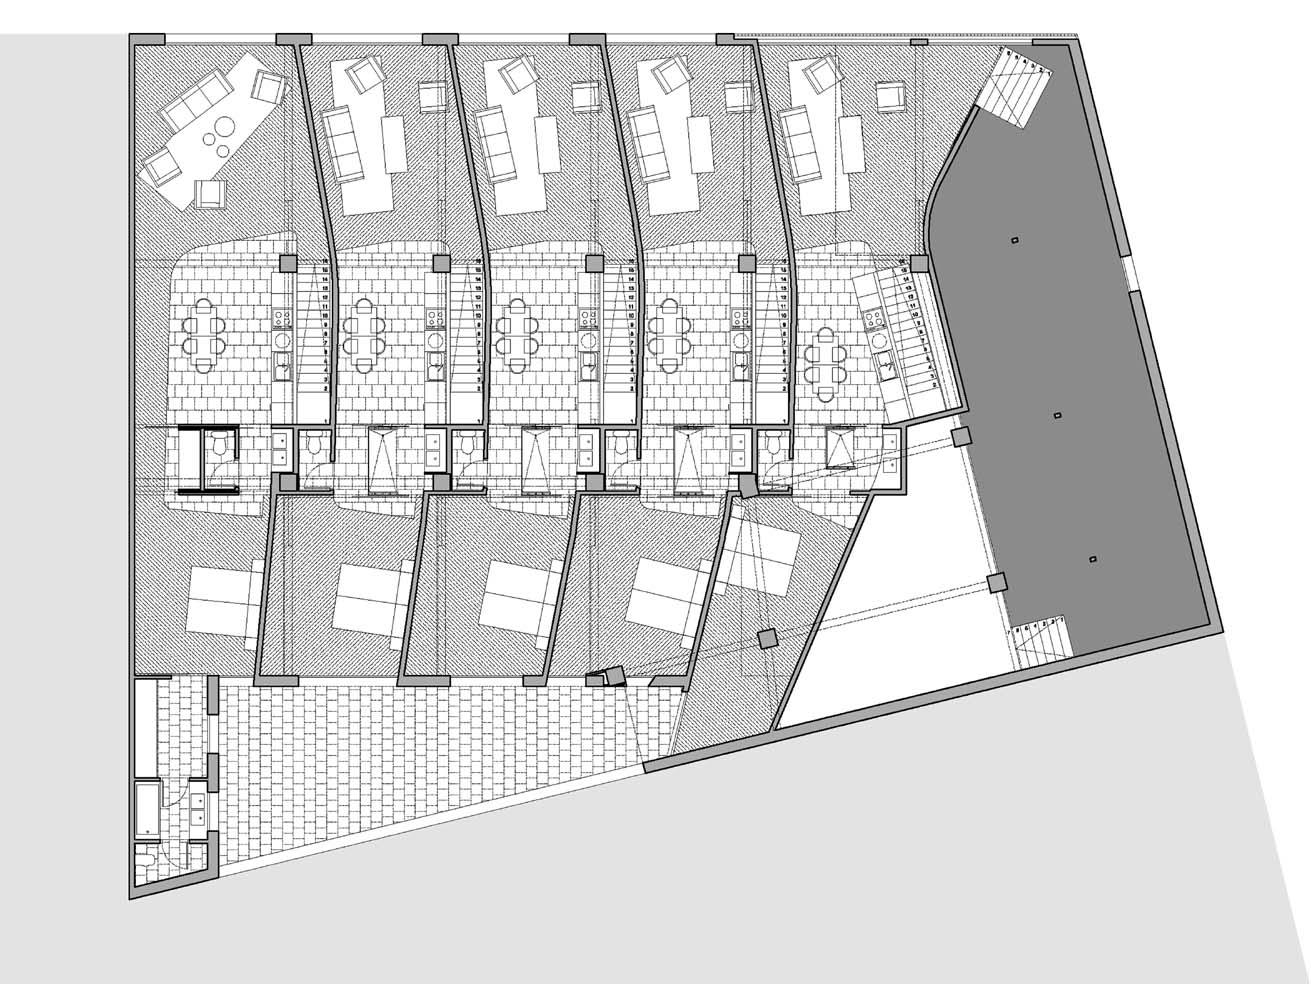 Rehabilitaci per a 5 lofts 2001 ona arquitectes for Oficina habitatge badalona